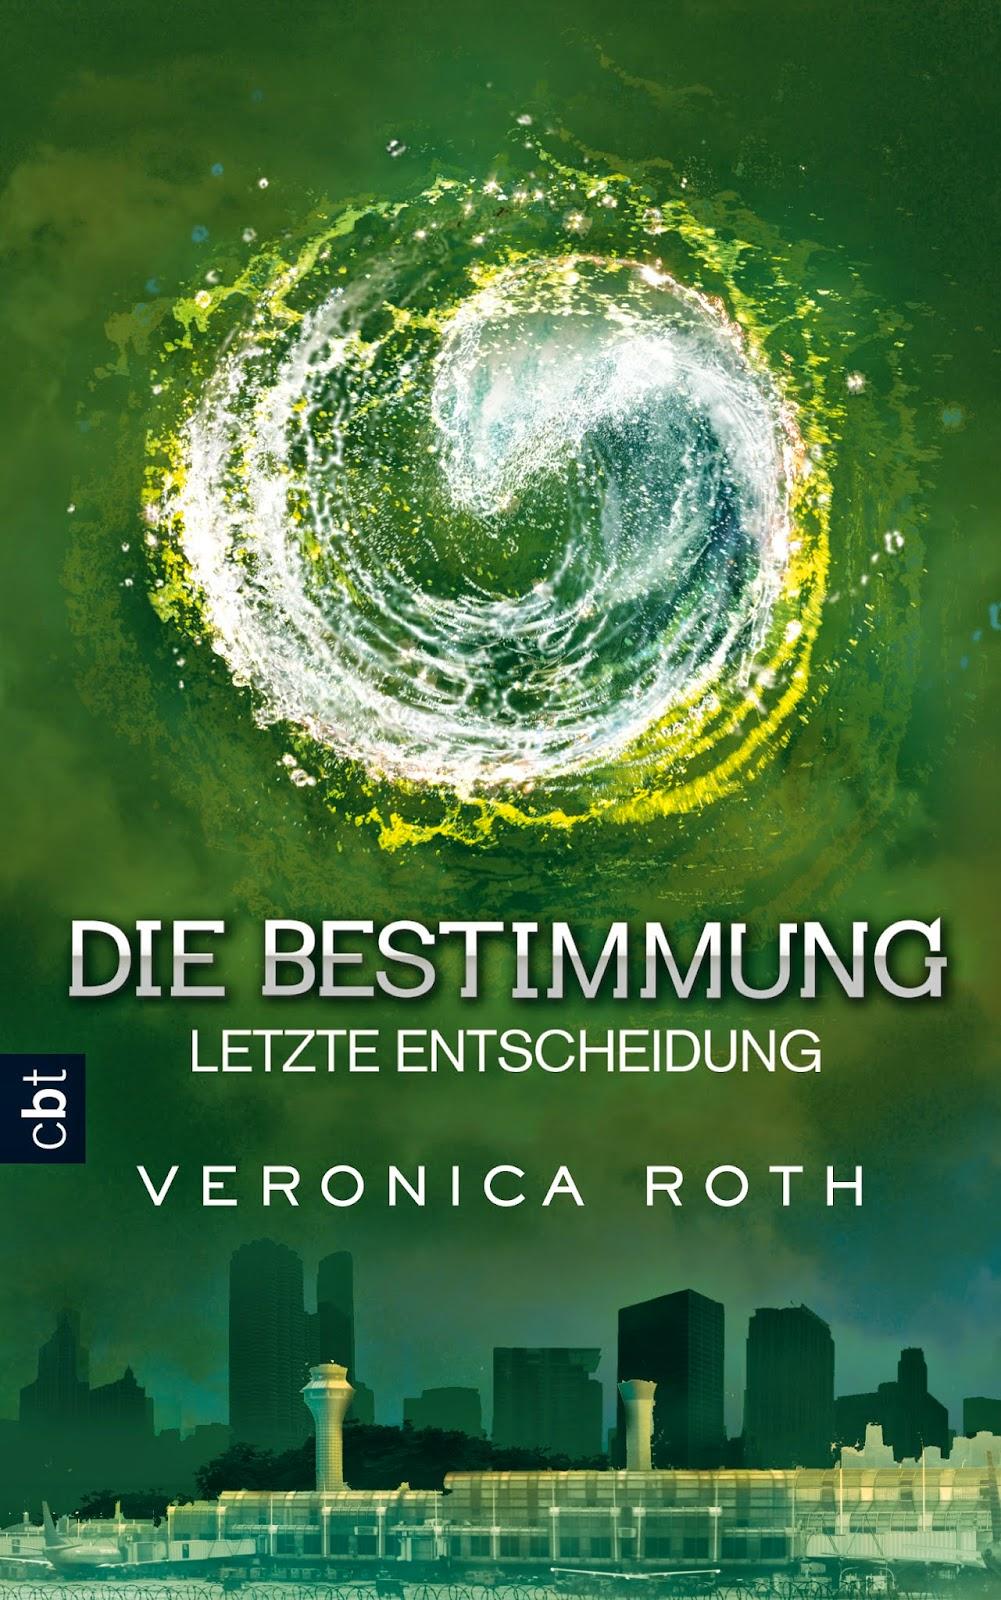 http://www.randomhouse.de/Presse/Buch/Die-Bestimmung-Band-1/Veronica-Roth/pr381172.rhd?pub=1&men=